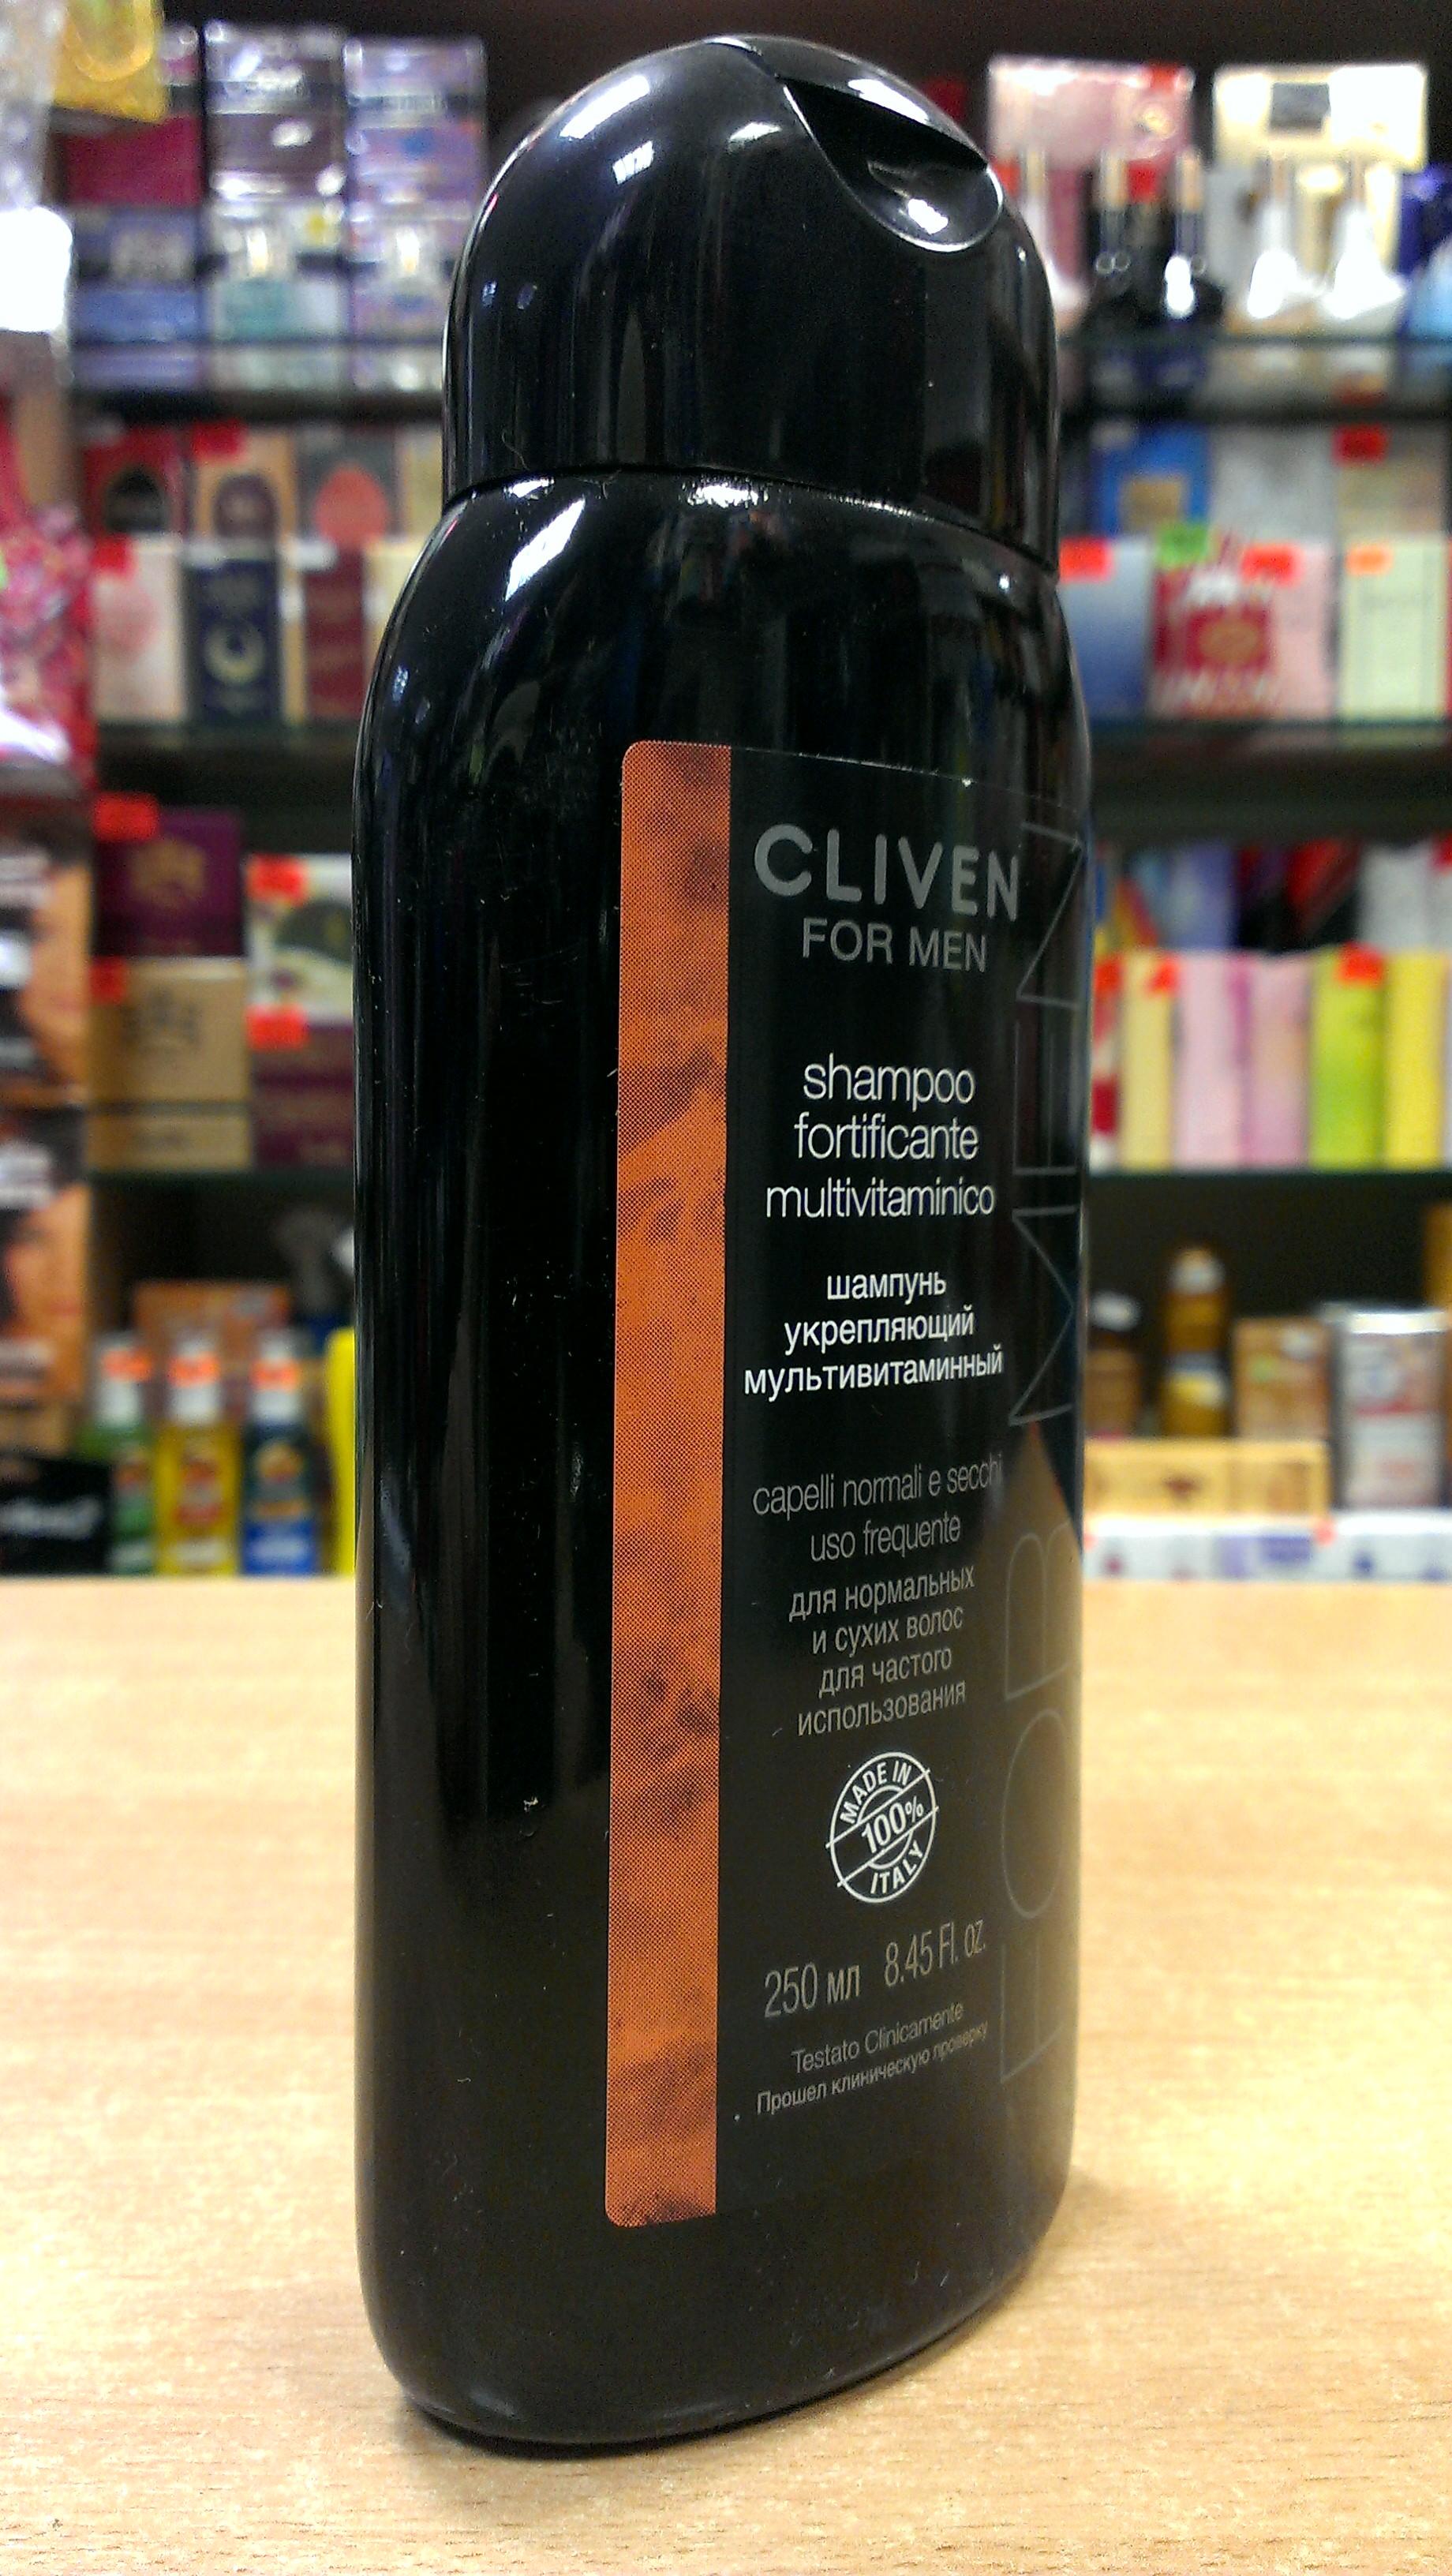 CLIVEN 401 - 360 руб.- Пена для бритья (200 мл) + Дезодорант (200 мл) Производитель: Италия